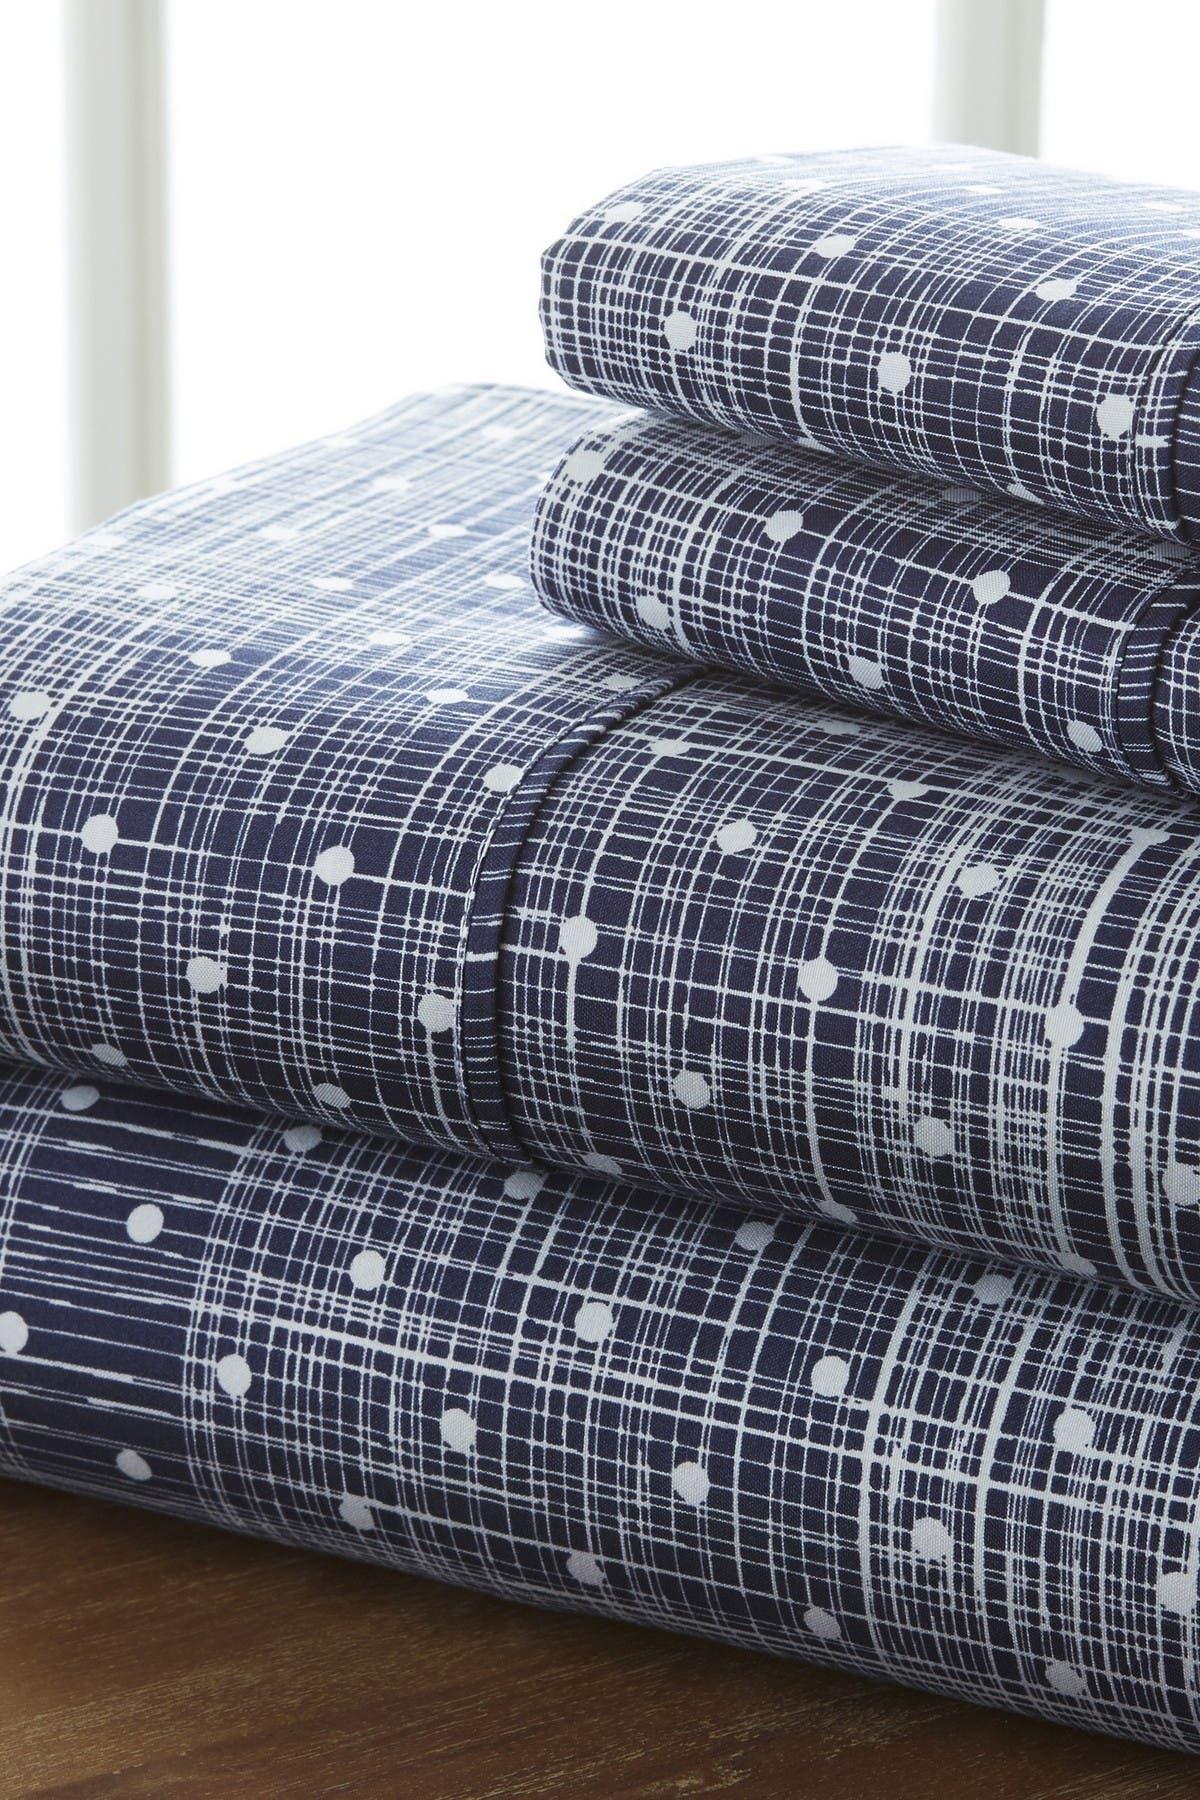 Image of IENJOY HOME Home Spun Premium Ultra Soft Polka Dot Pattern 3-Piece Twin Bed Sheet Set - Navy